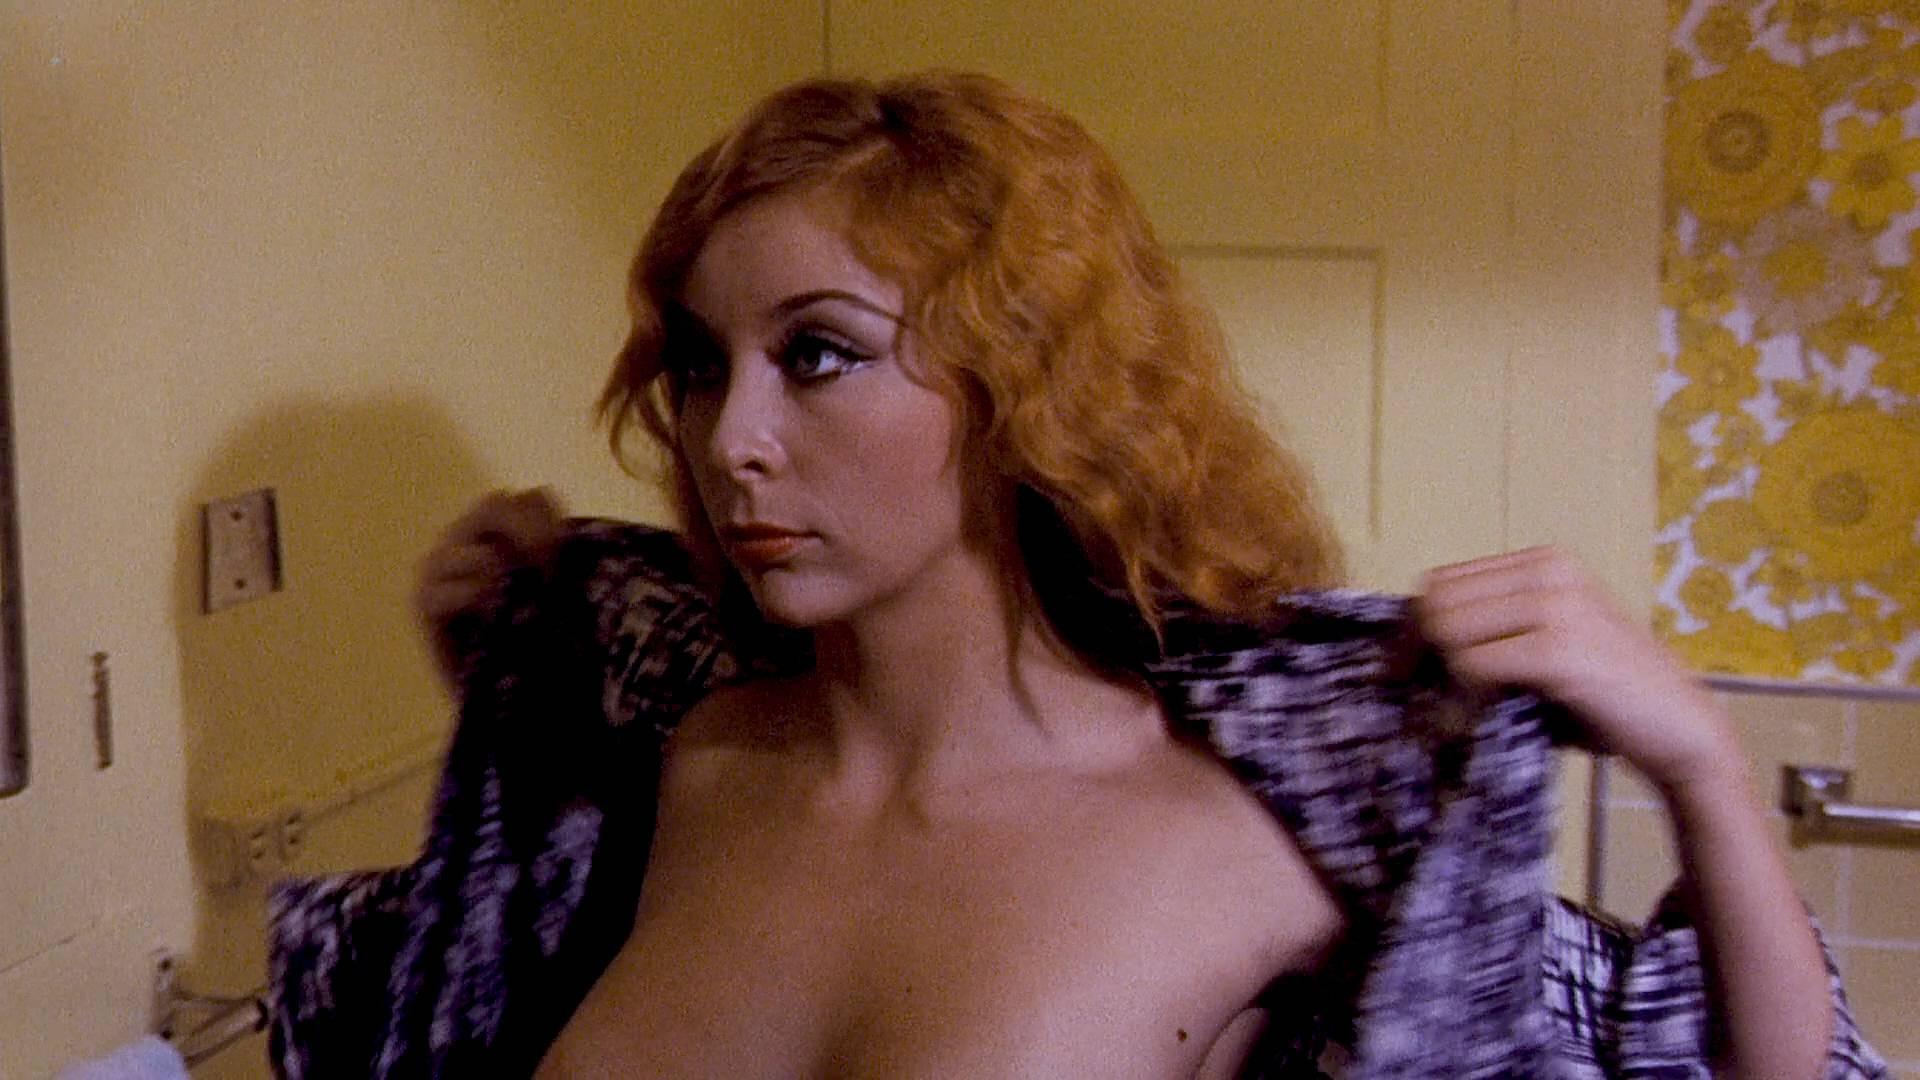 Angelique Pettyjohn Porn Movies showing porn images for angelique pettyjohn hardcore porn